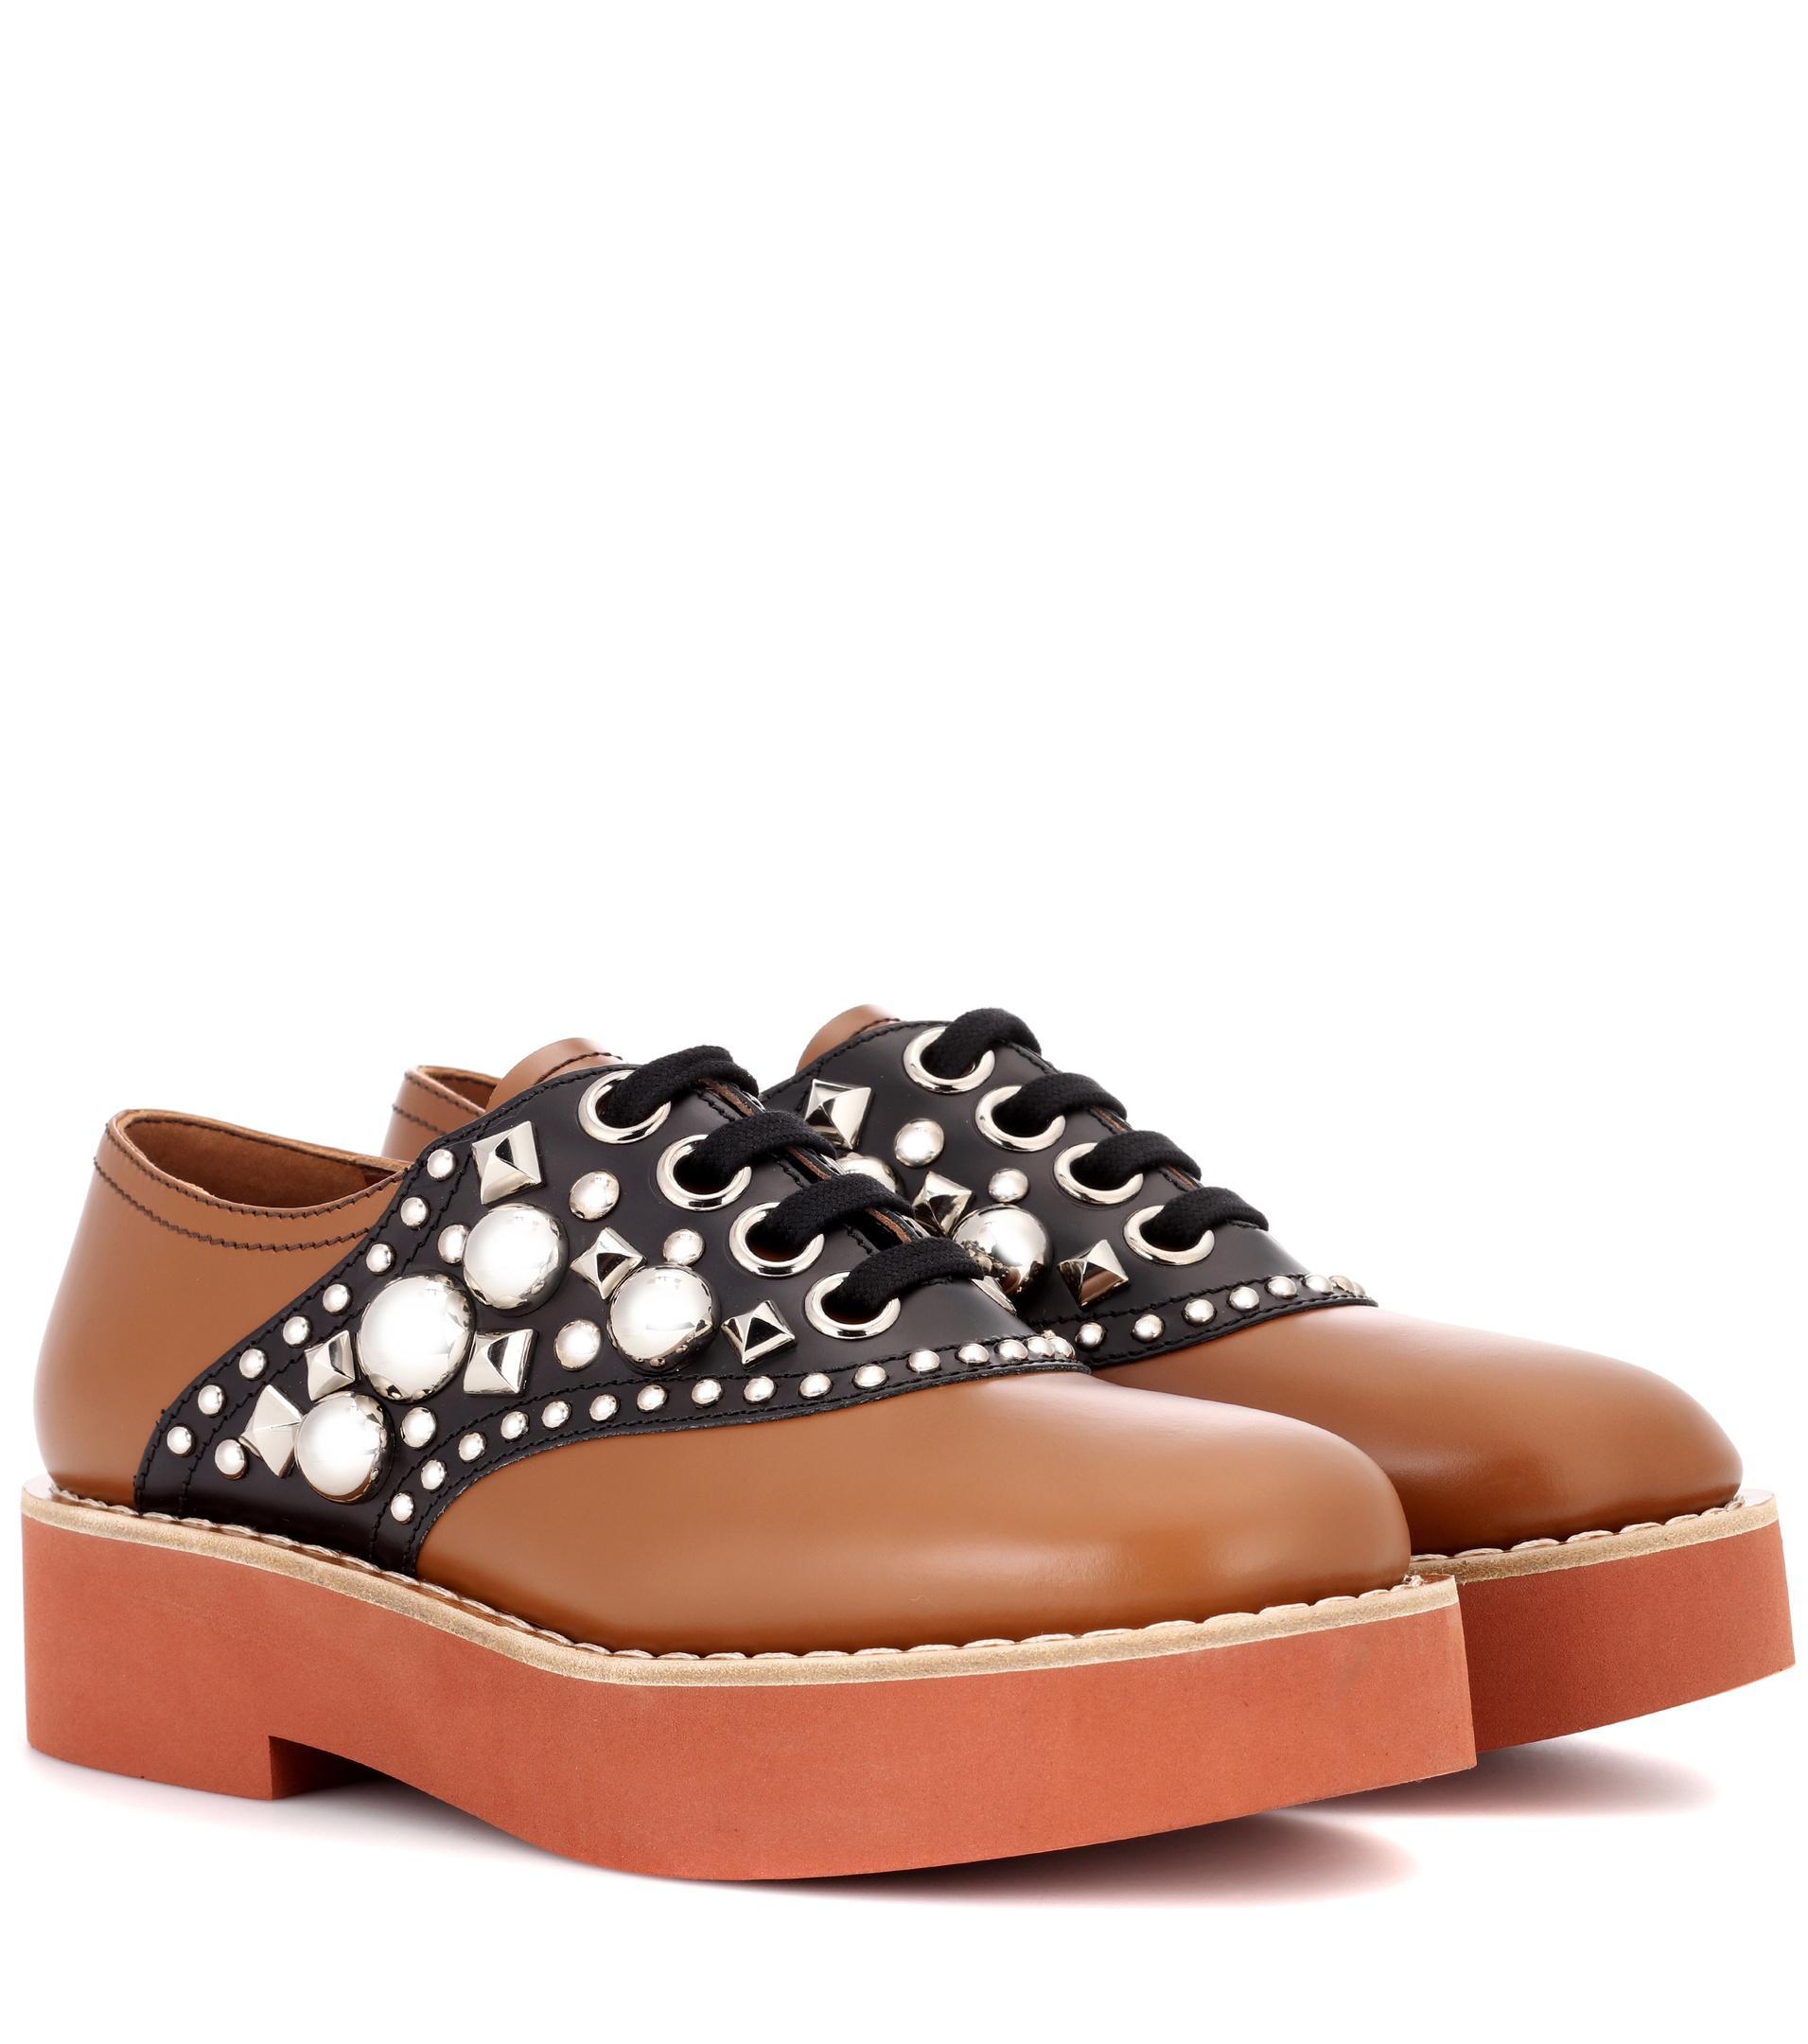 Miu Miu Embelli Chaussures Derby - Marron nt7f2